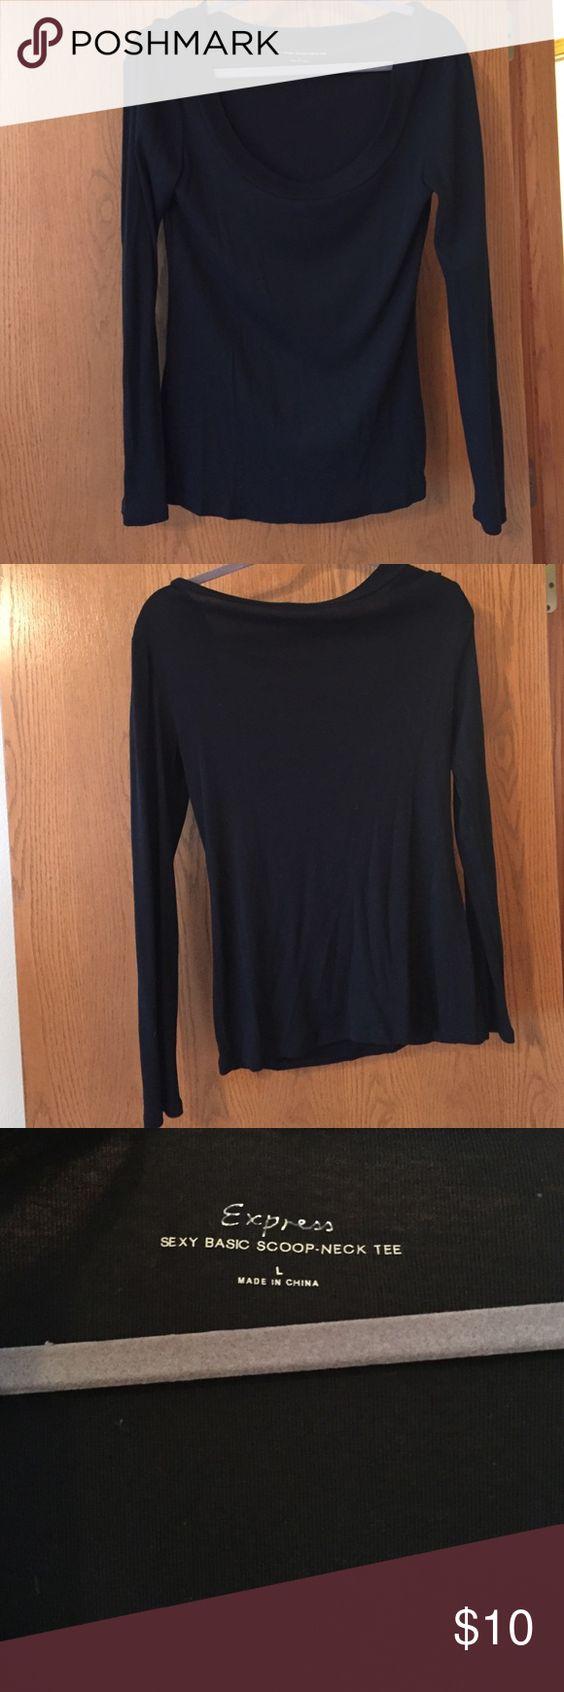 Black t shirt express - Express Long Sleeve Express Long Sleeve Black Scoop Neck Shirt Express Tops Tees Long Sleeve